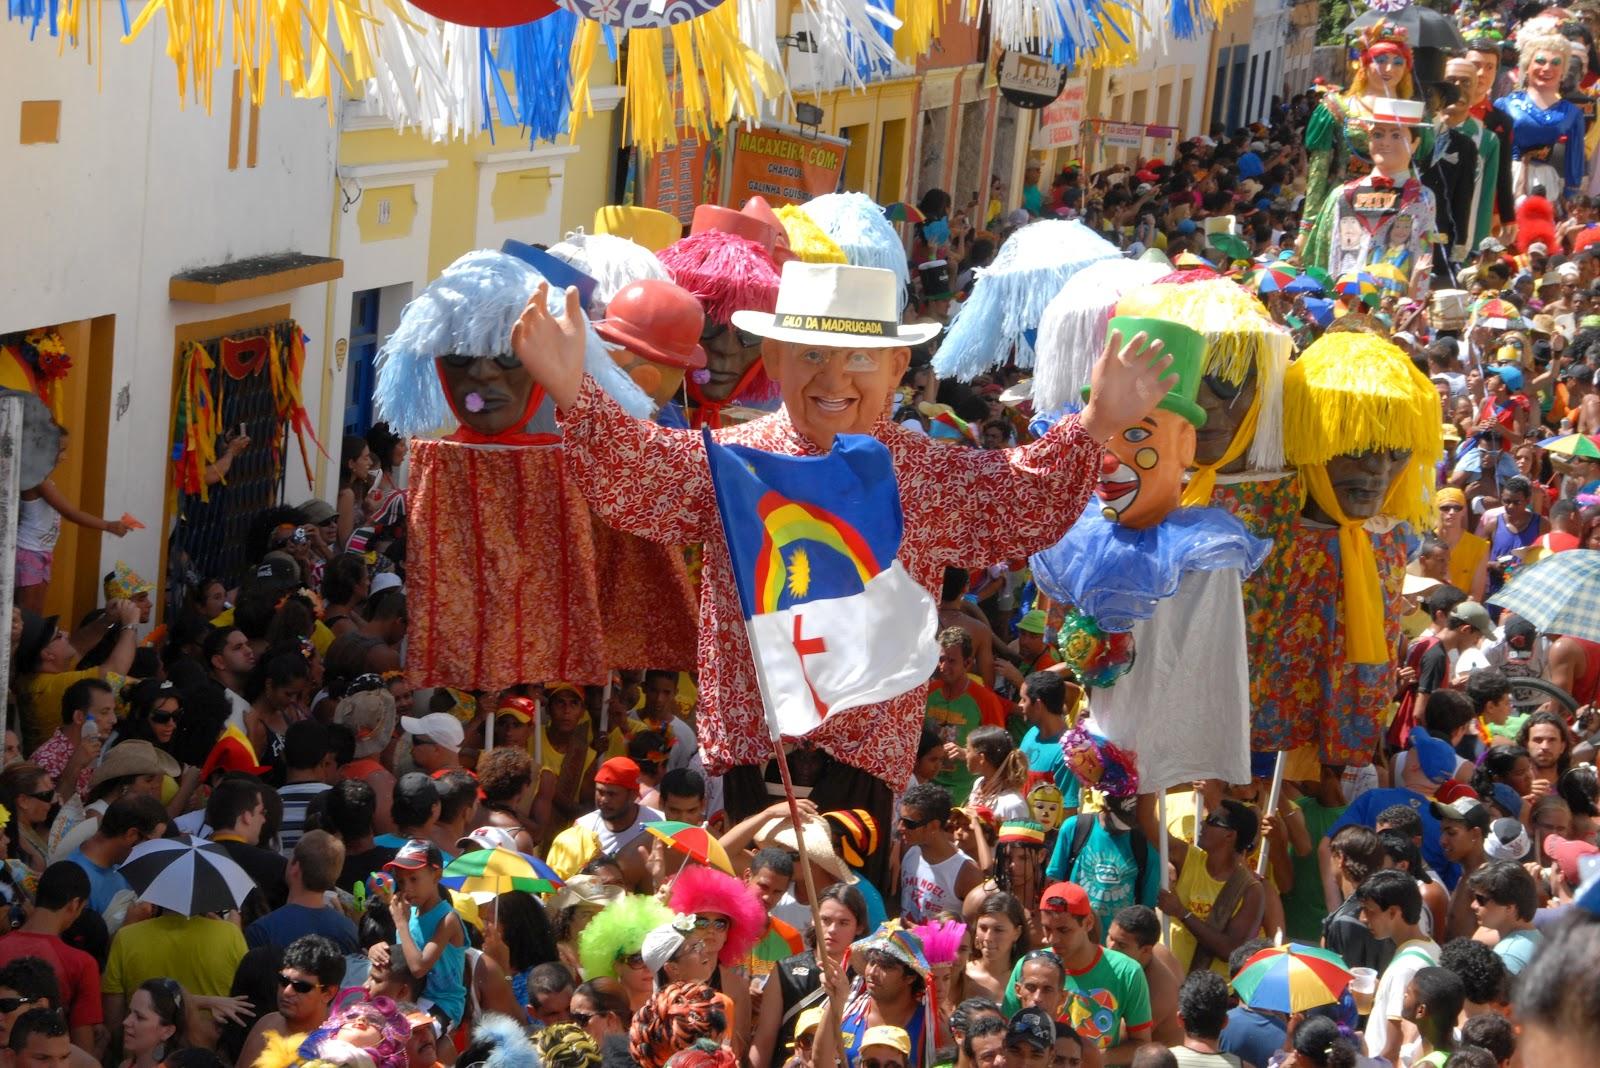 http://2.bp.blogspot.com/-mDf9JZTZDDY/T0KCCGlQsqI/AAAAAAAAIWg/OXVfZFG5Hp0/s1600/Bonecos_de_Olinda_-_Pernambuco,_Brasil.jpg